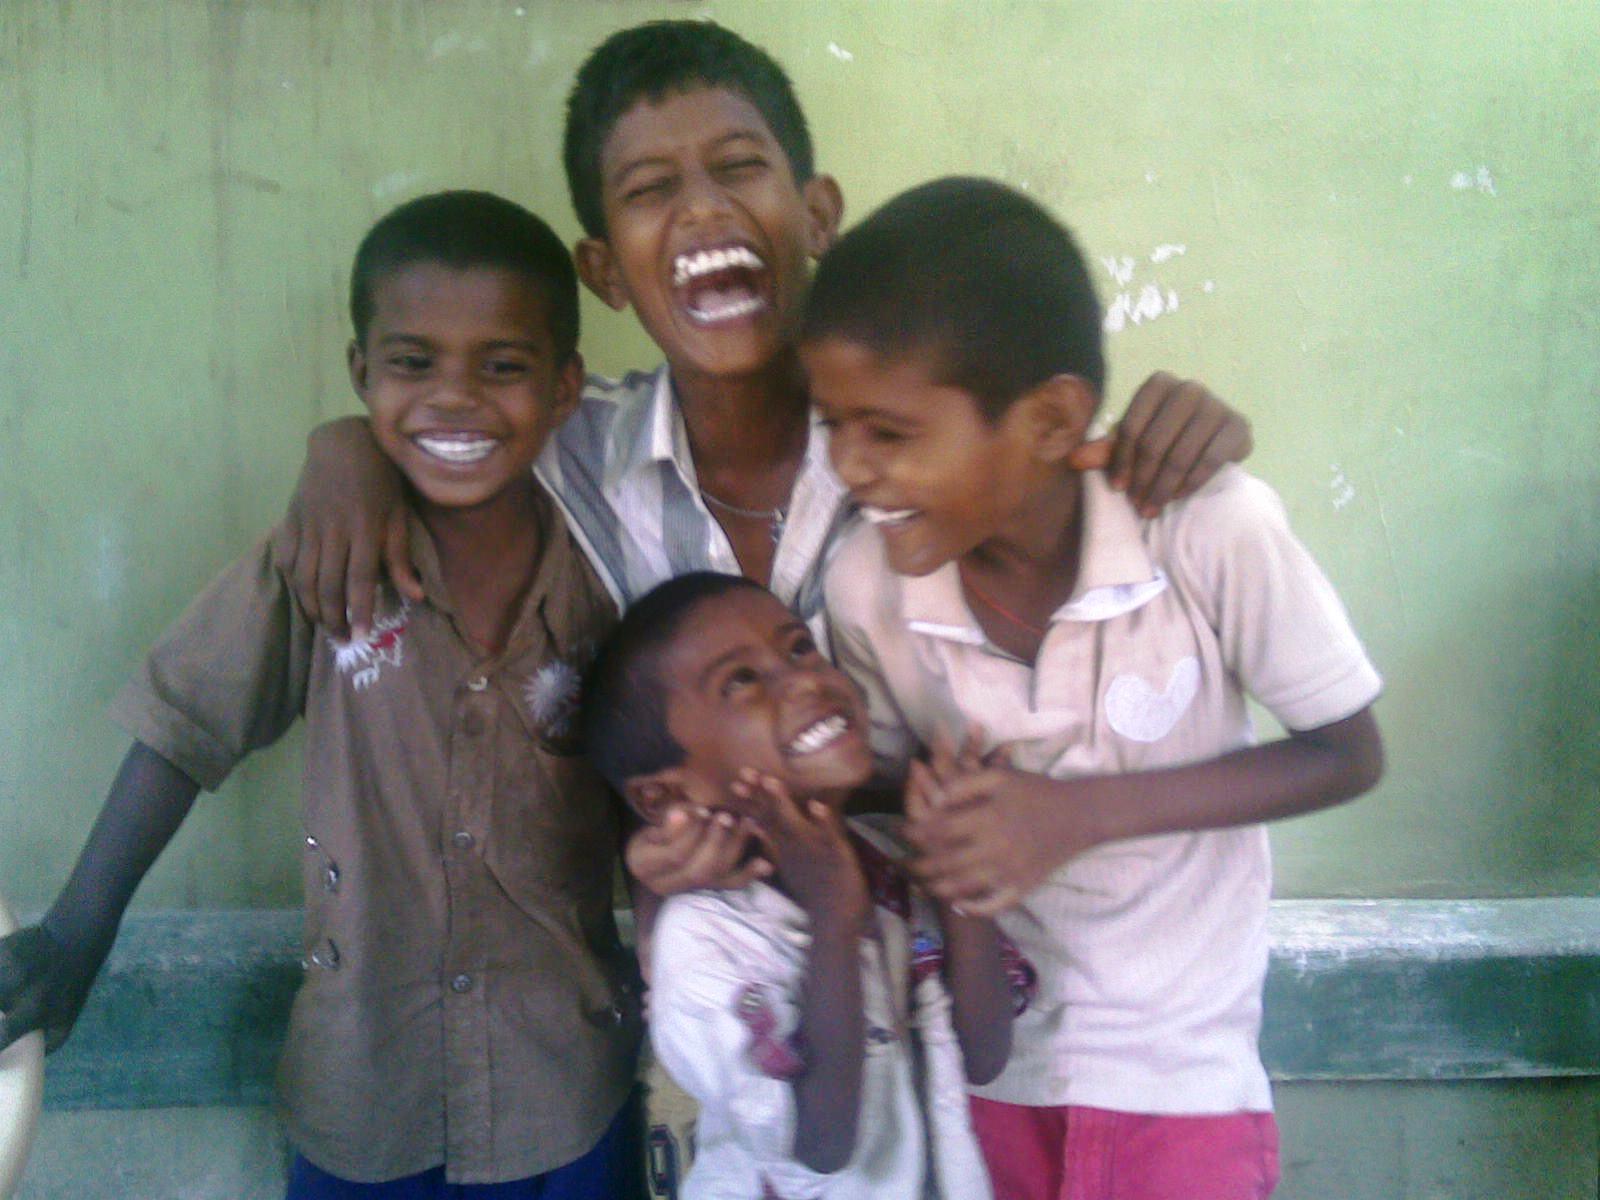 happy indians chieldsHappy Indians